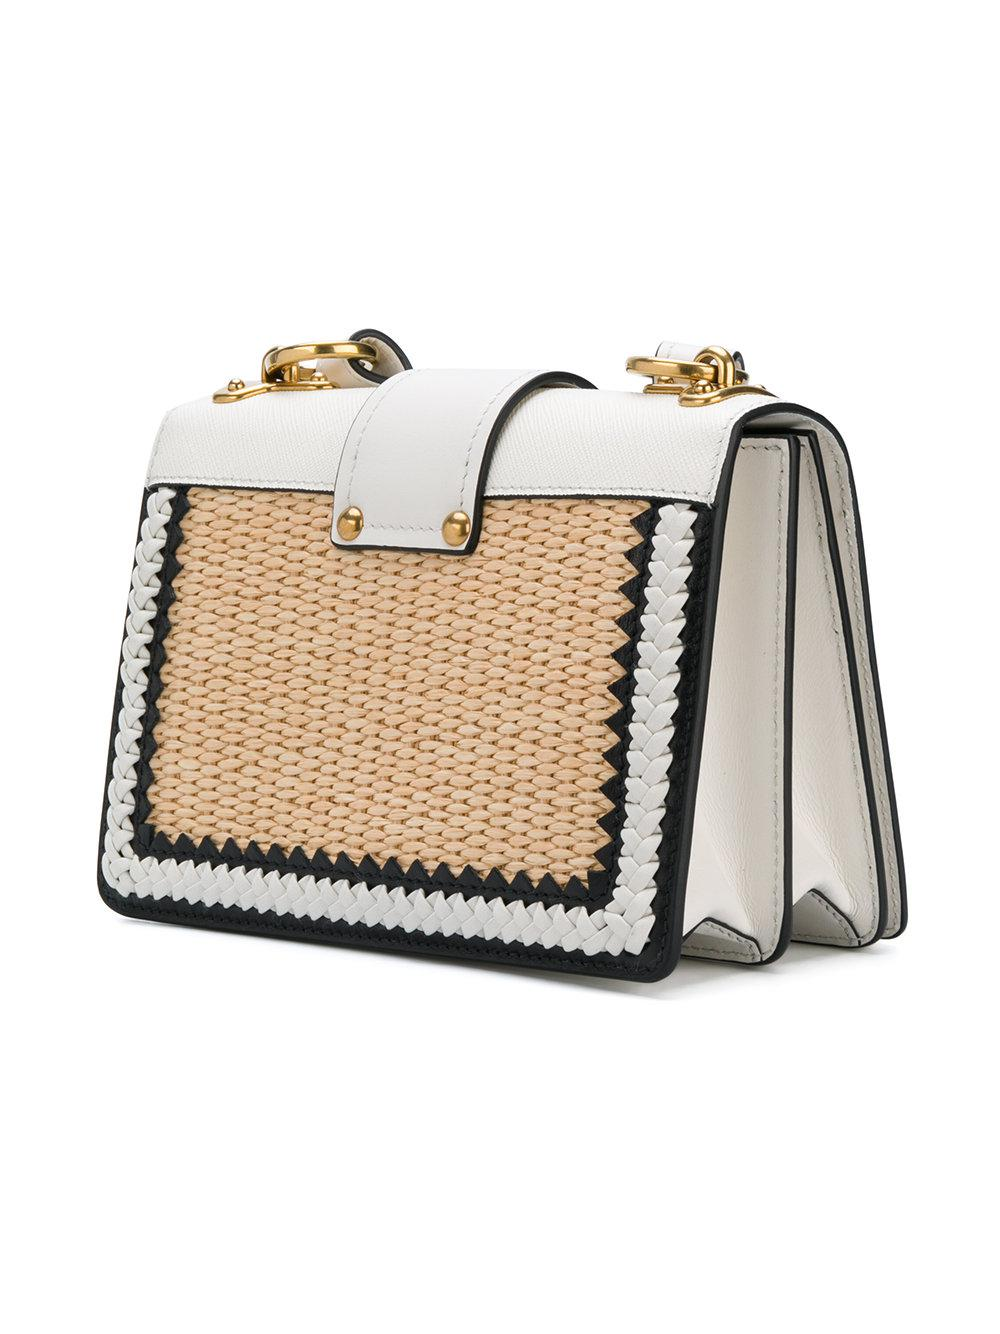 aec632dc2d4592 Prada White Raffia Cahier Shoulder Bag in White - Lyst